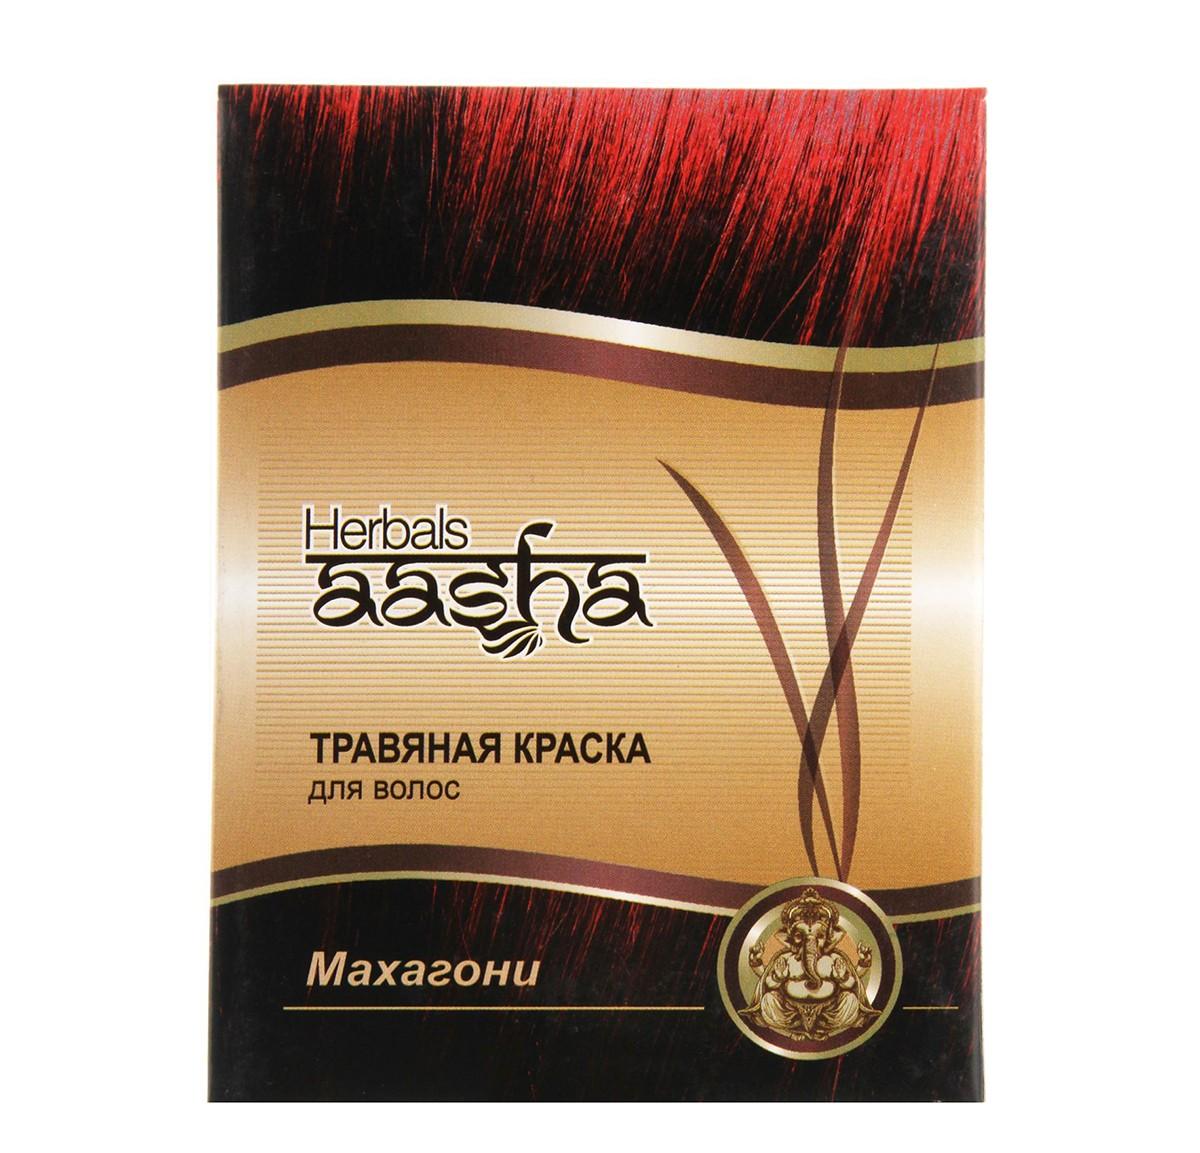 Краска для волос на основе хны aasha